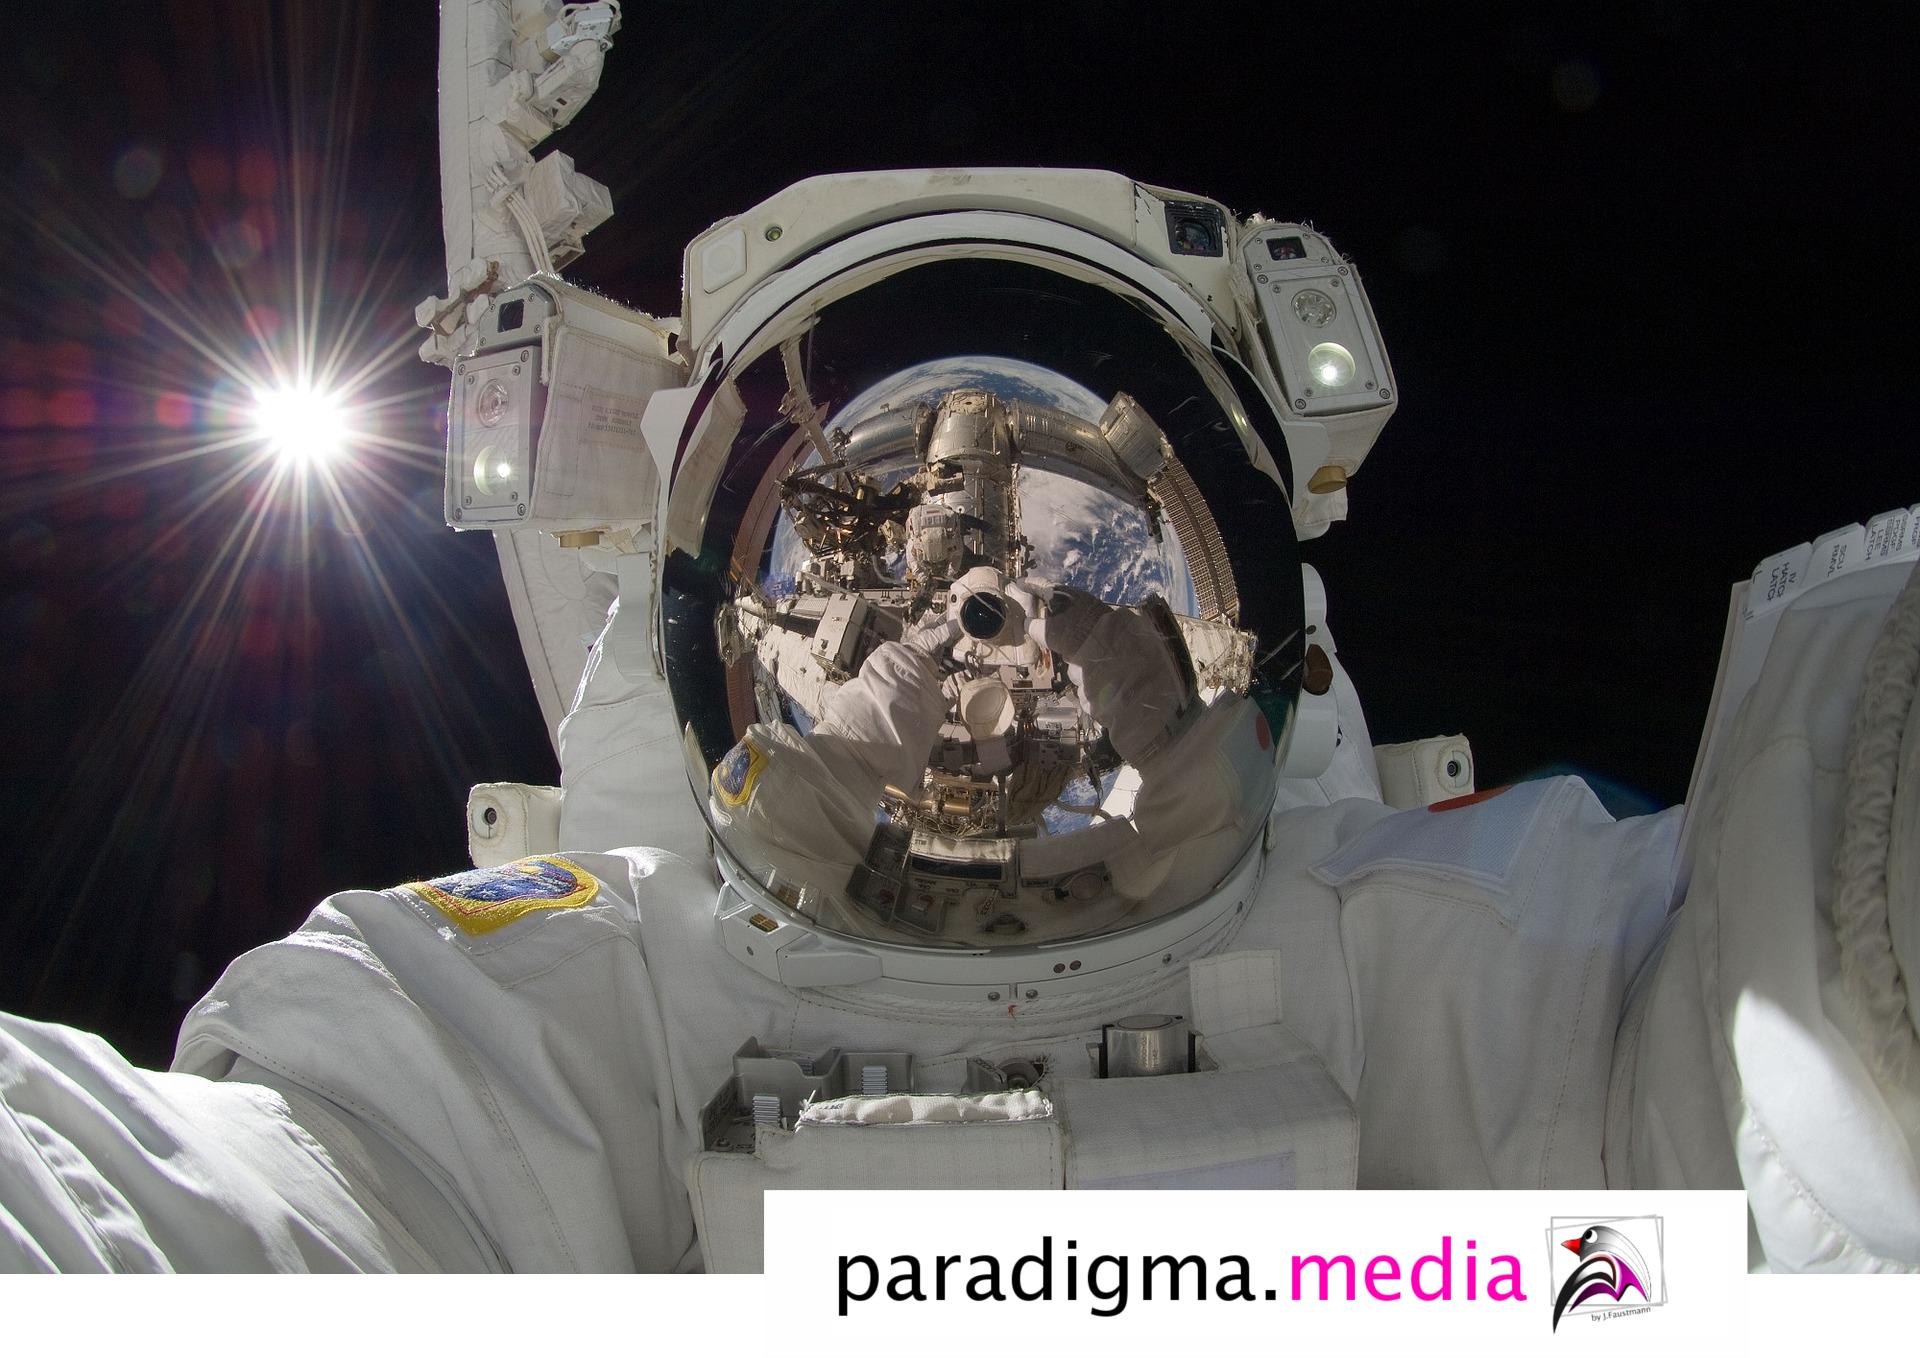 Paradigma.media werbung Berlin Astronaut Atronaut Spiegelschutzfole